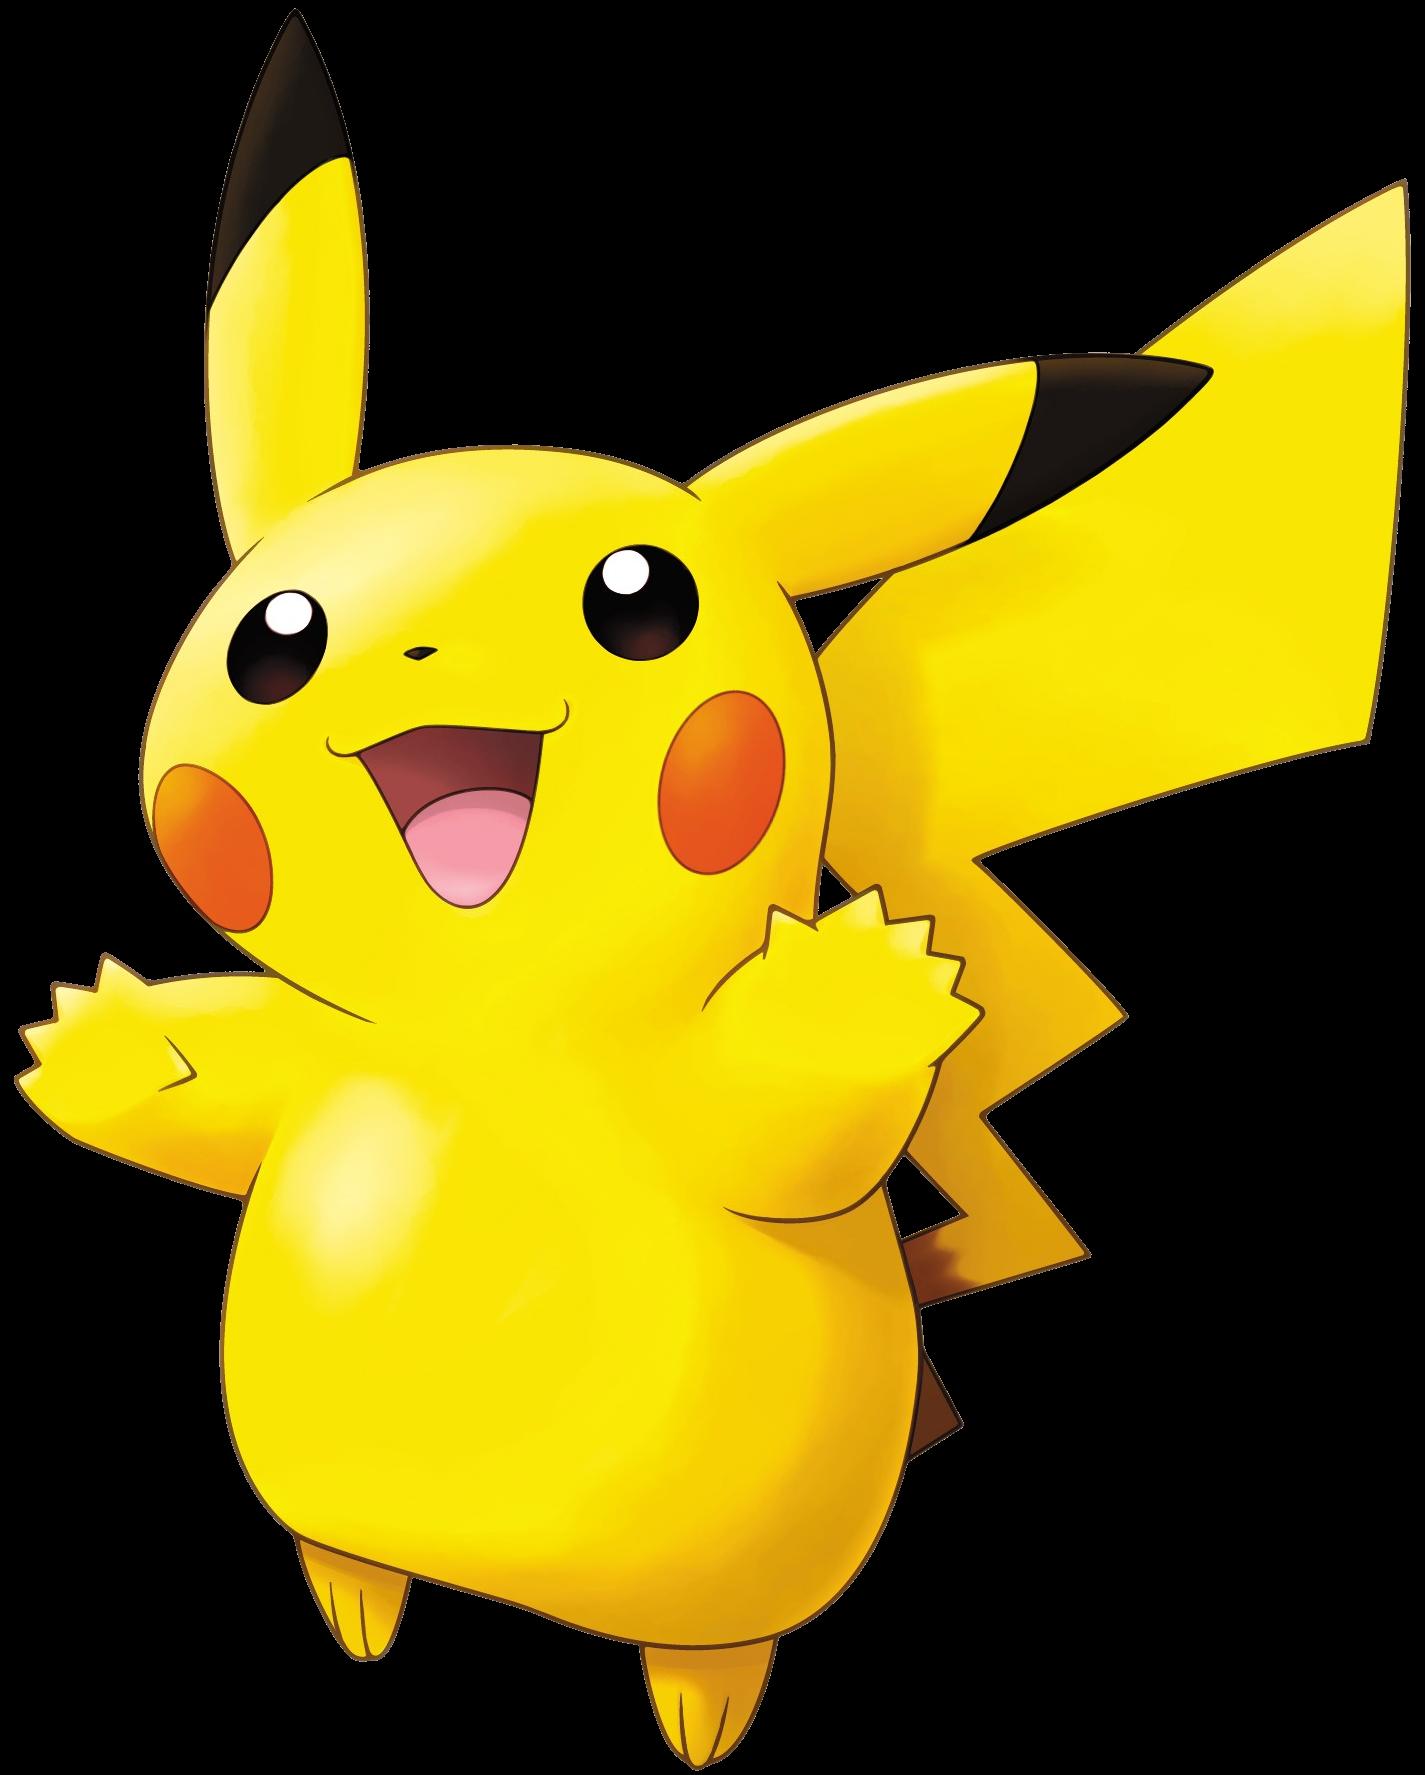 Pikachu clipart file. Image ranger png pok